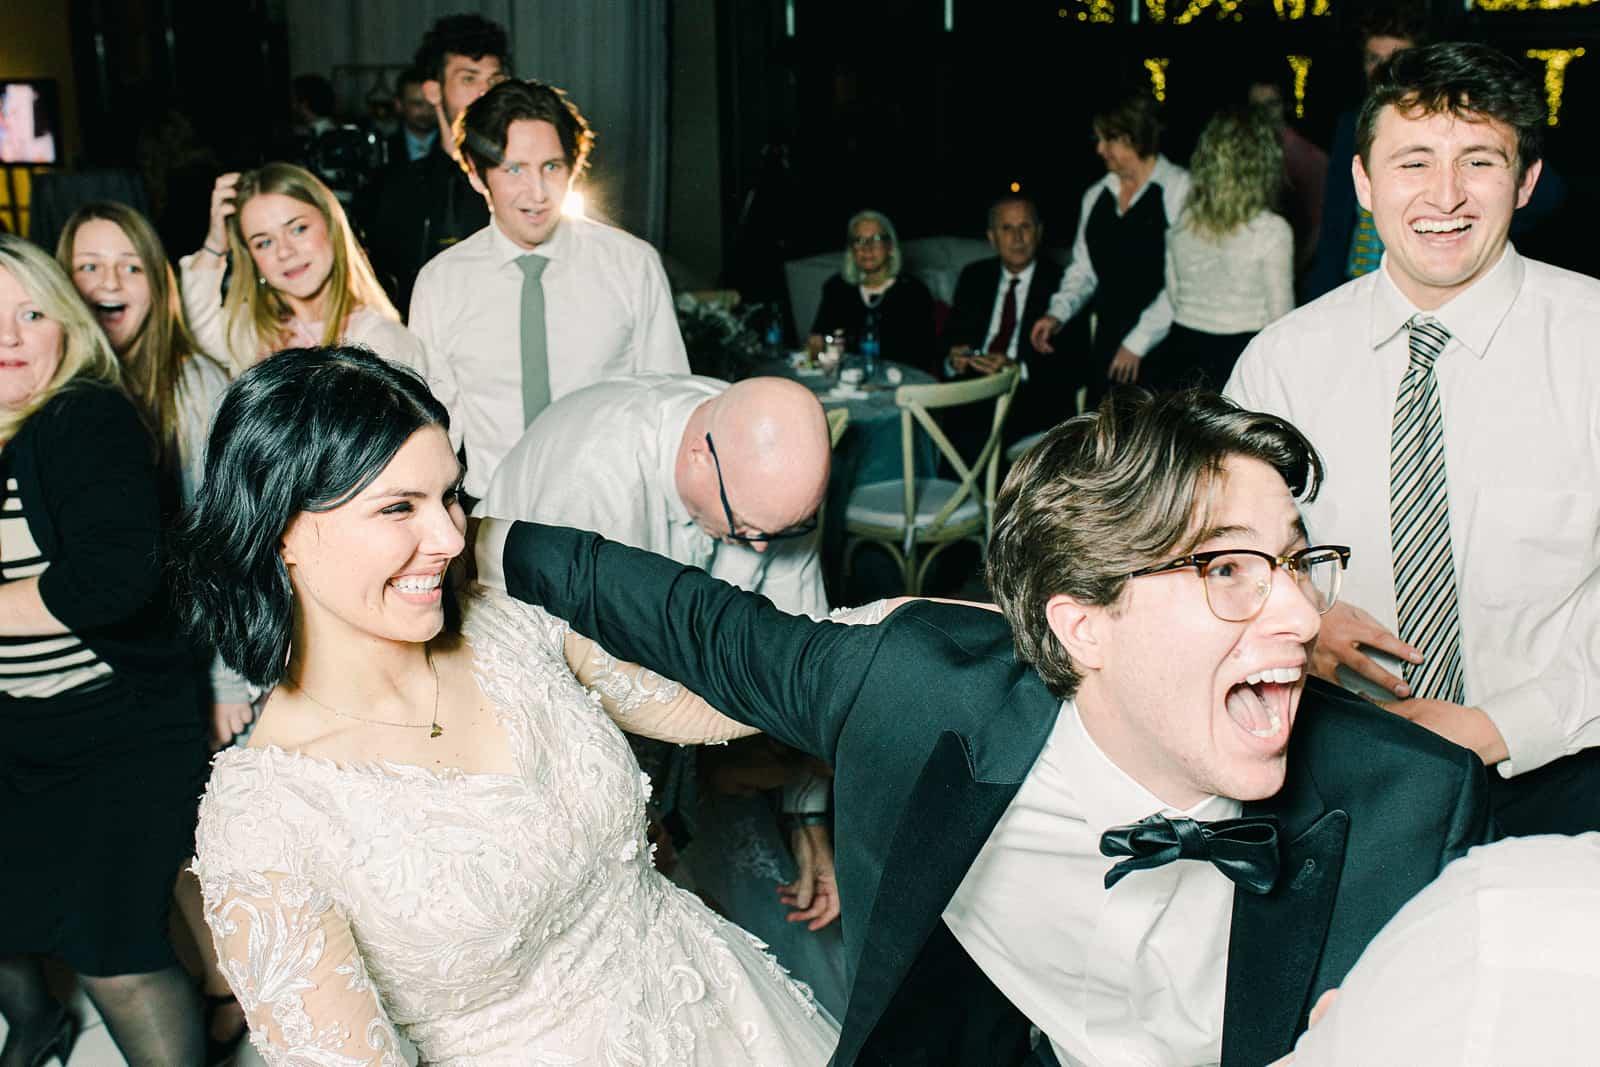 Bride and groom dance winter wedding reception